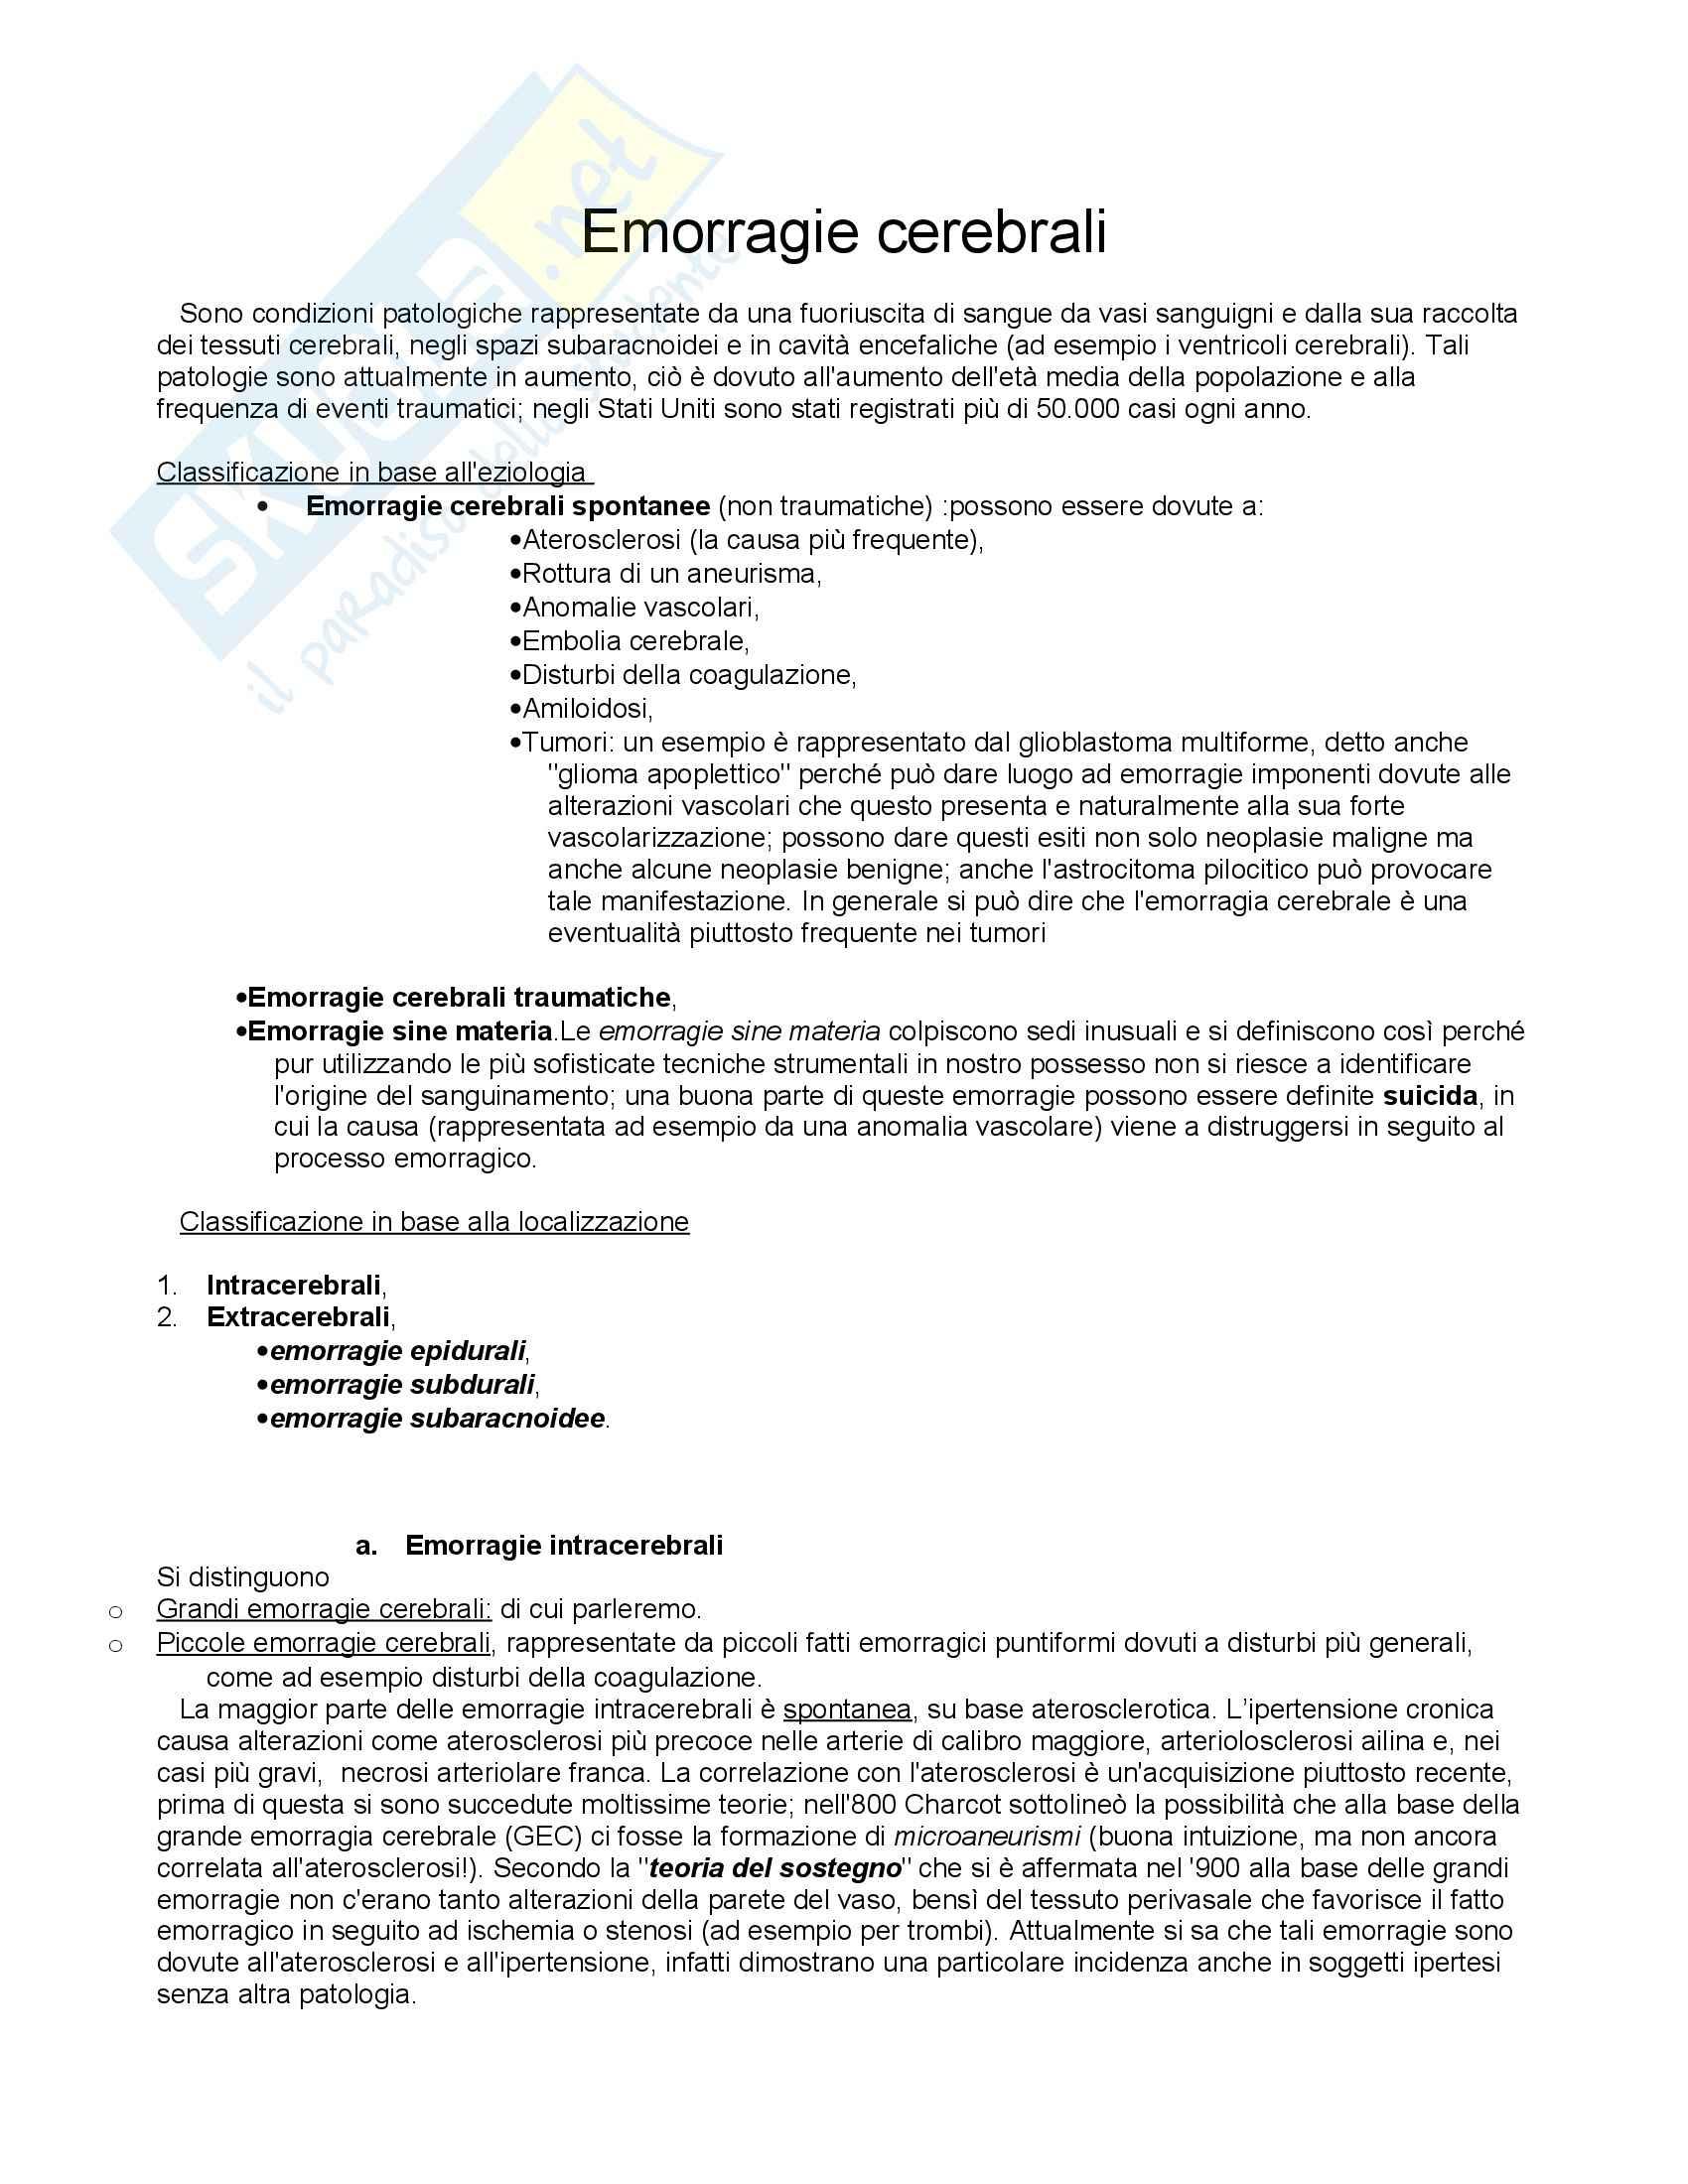 Anatomia Patologica - Patologia endocranica